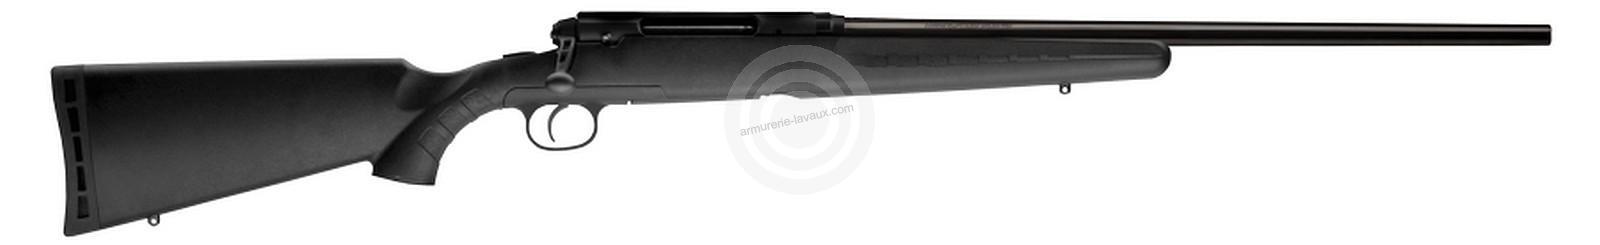 SAVAGE AXIS Varmint Heavy Barrel 22